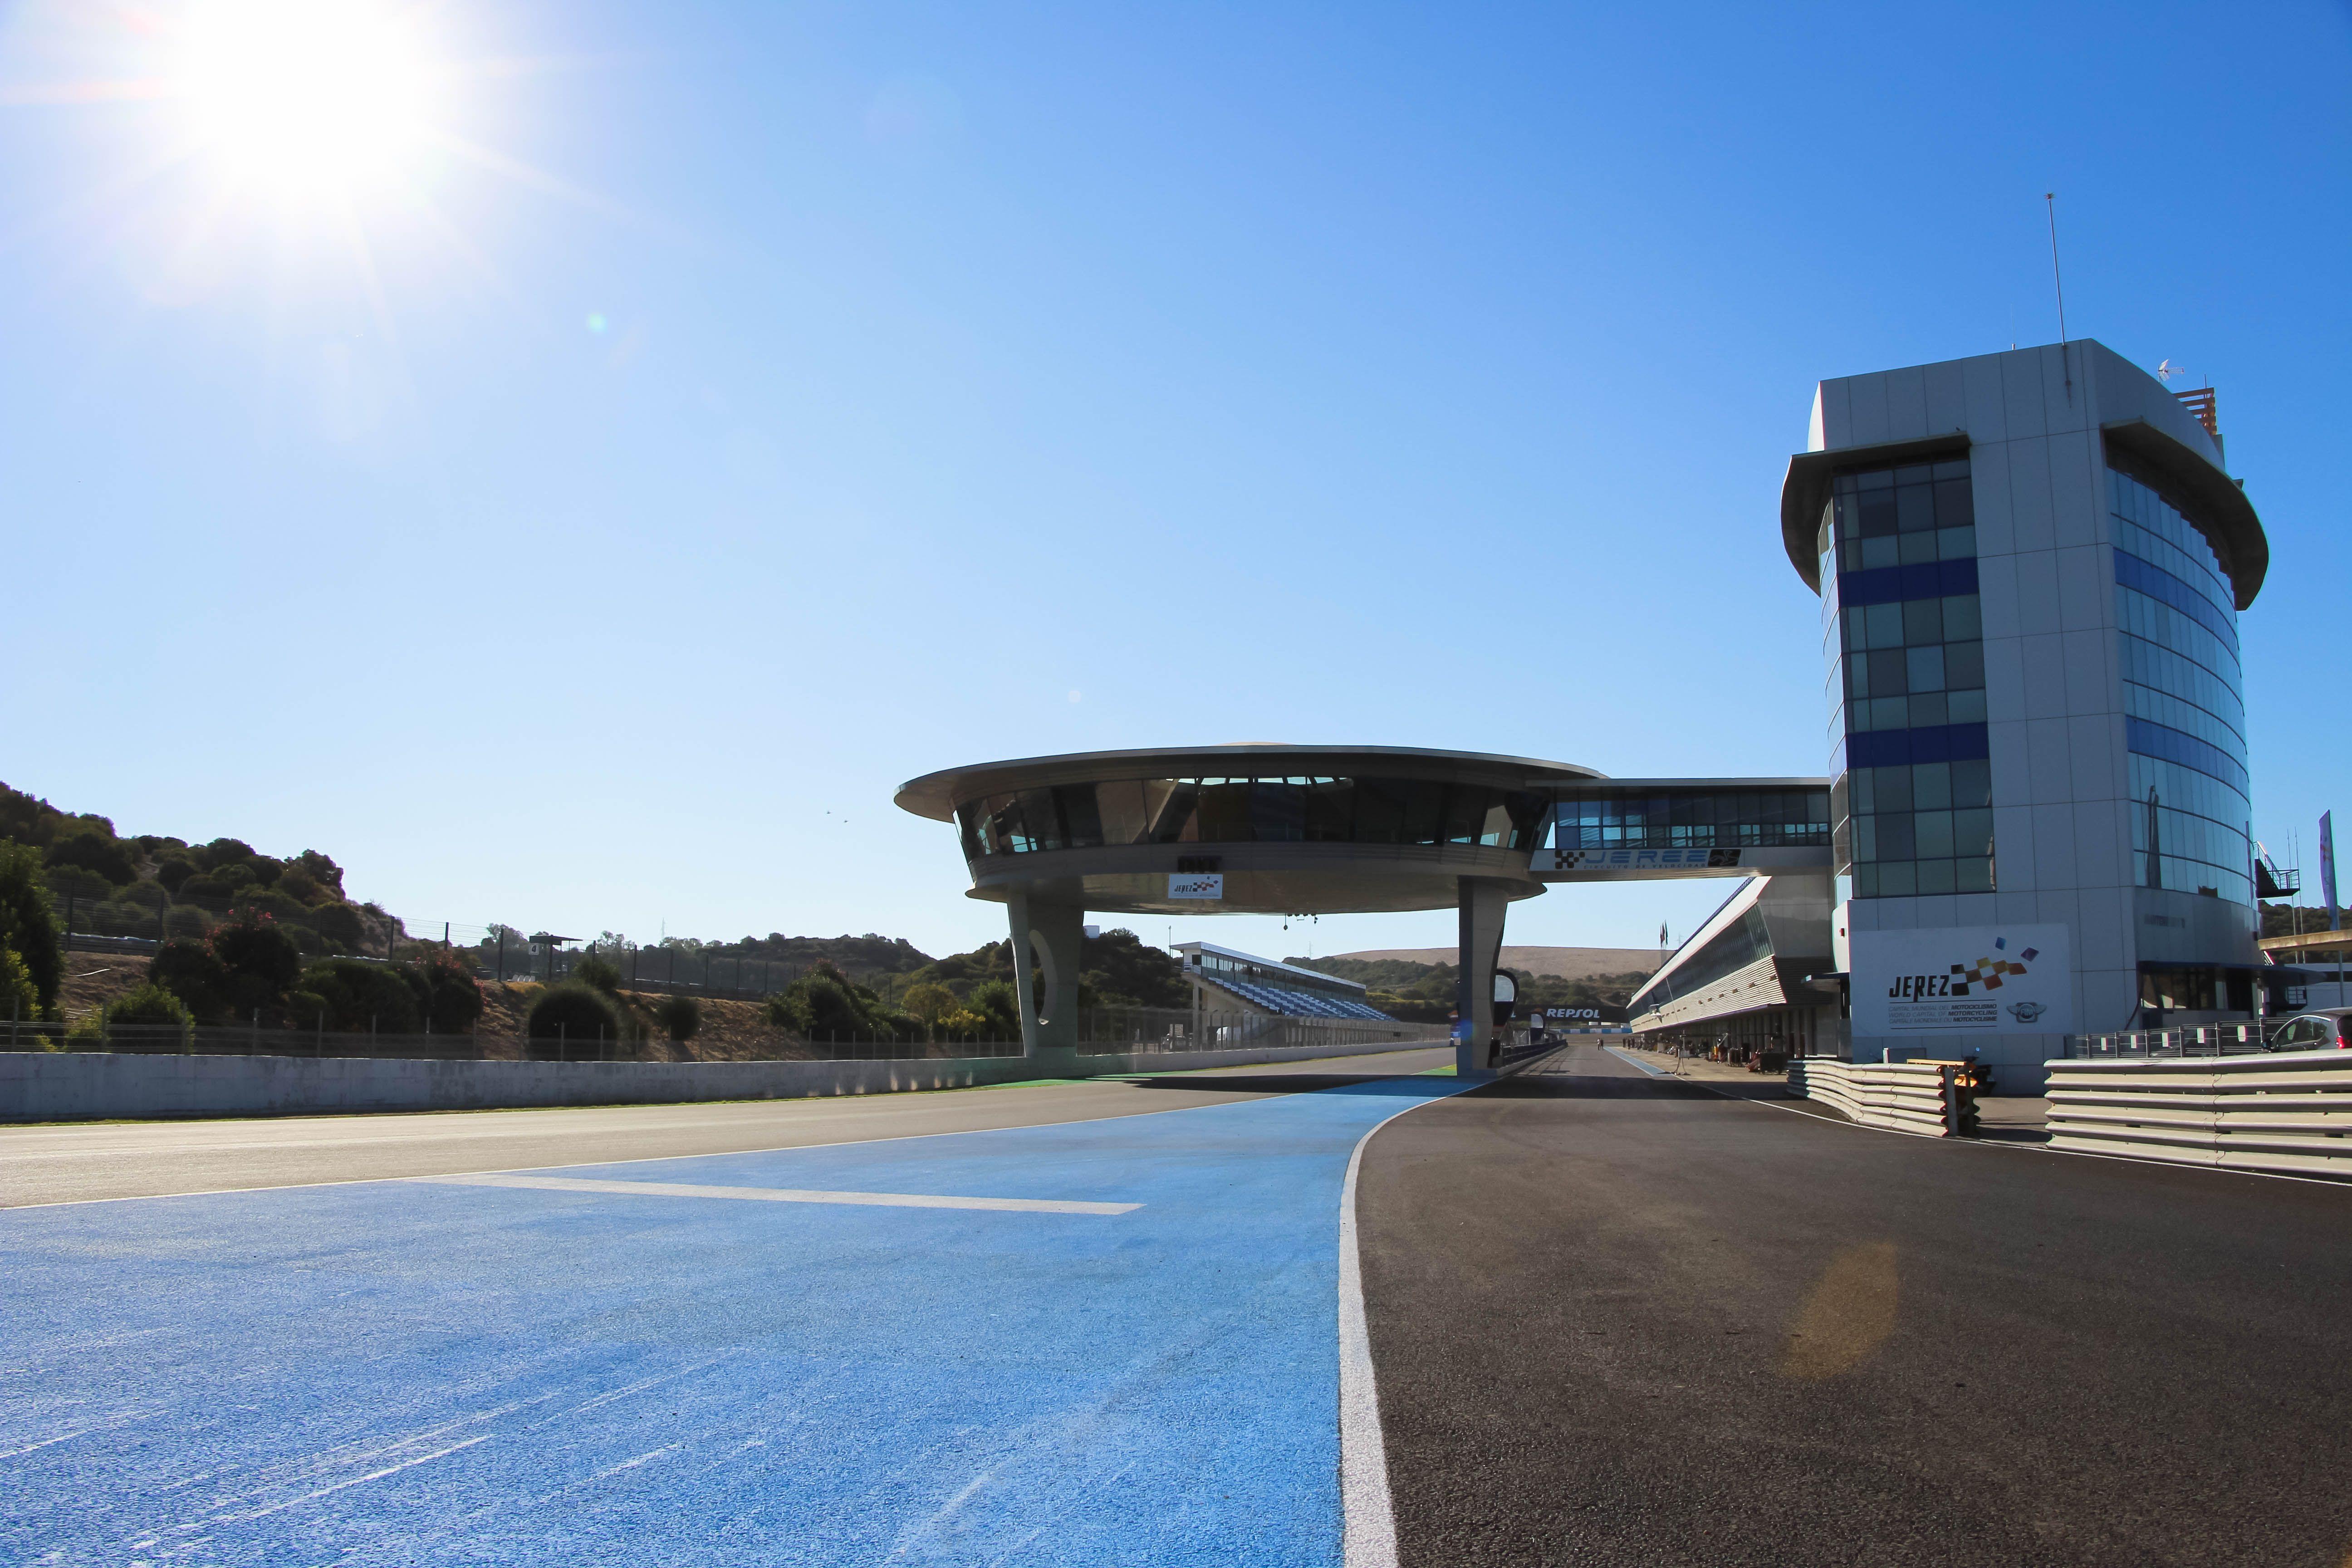 Formula 2 - Round 10: Circuito de Jerez, Spain